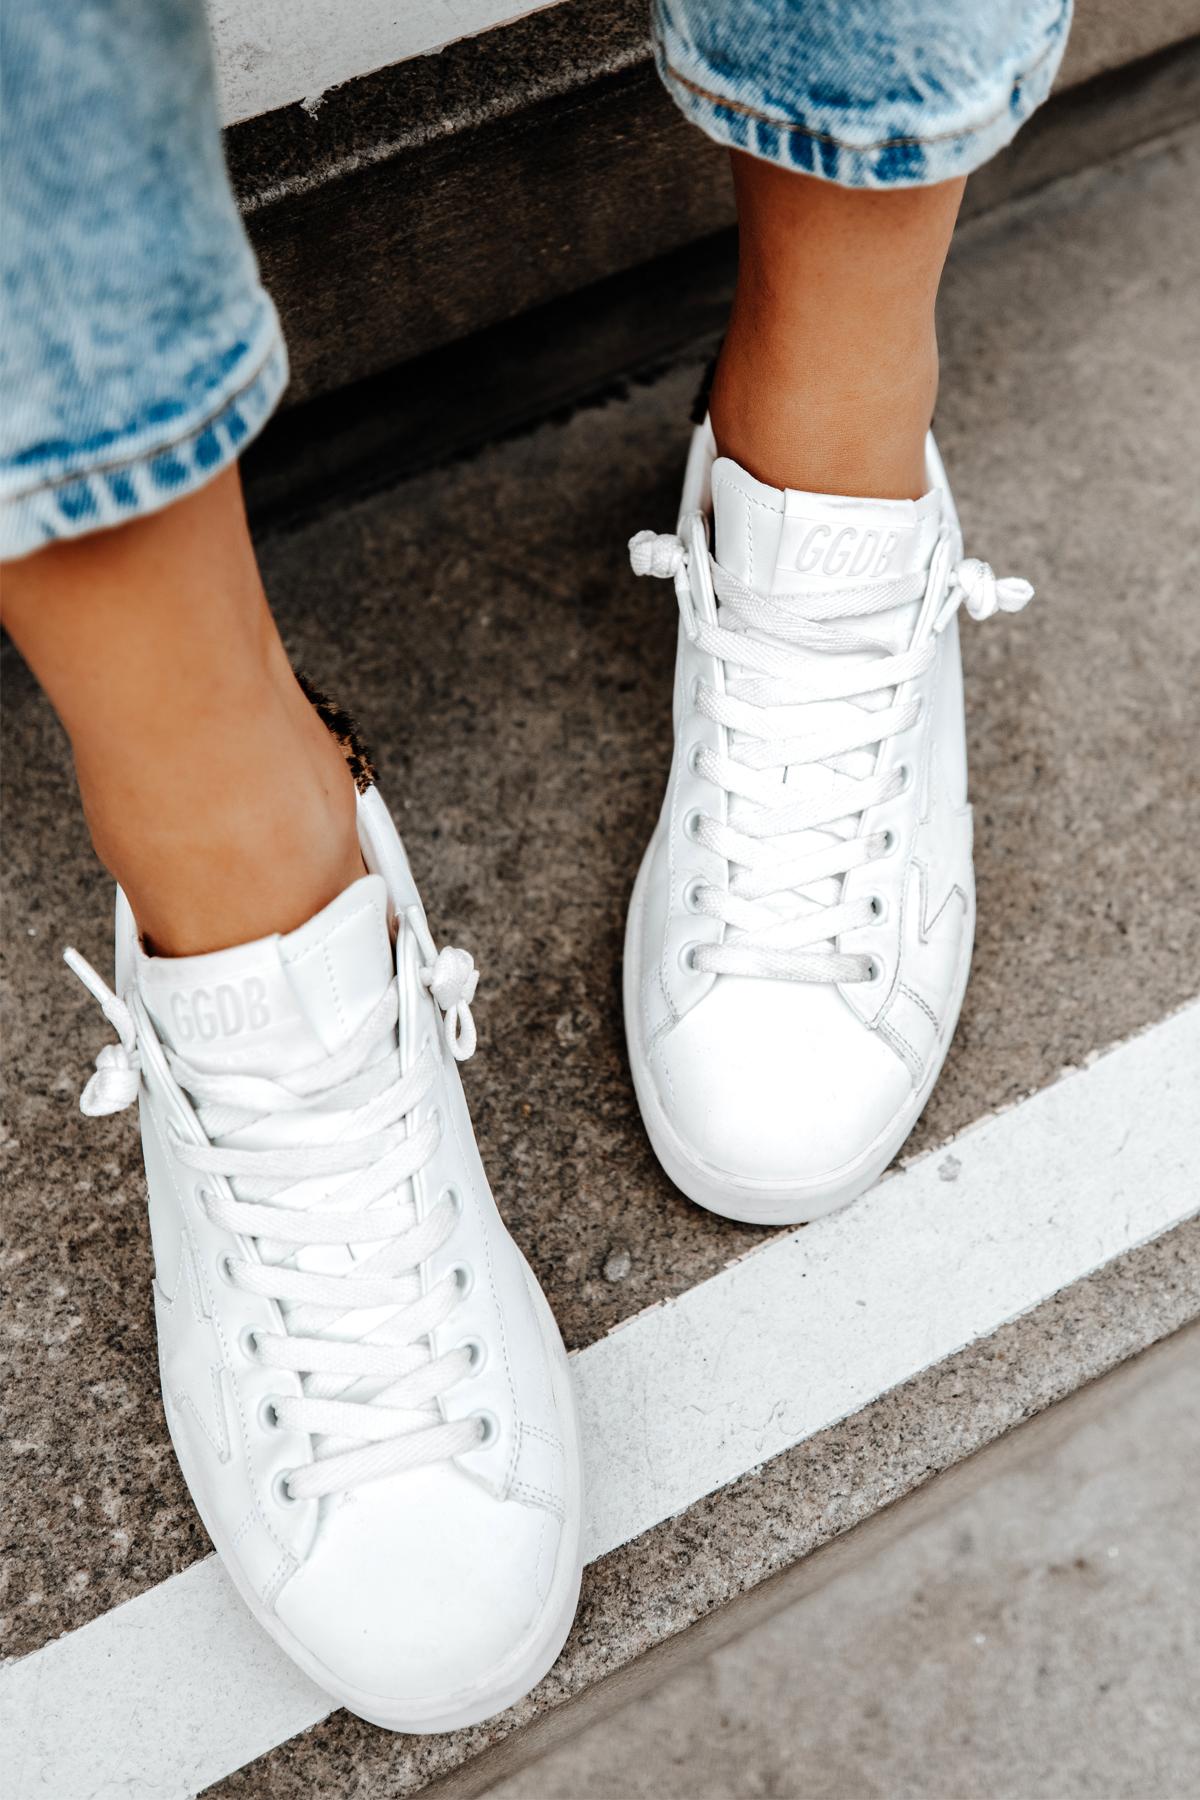 Fashion Jackson Wearing Golden Goose White Purestar Sneakers